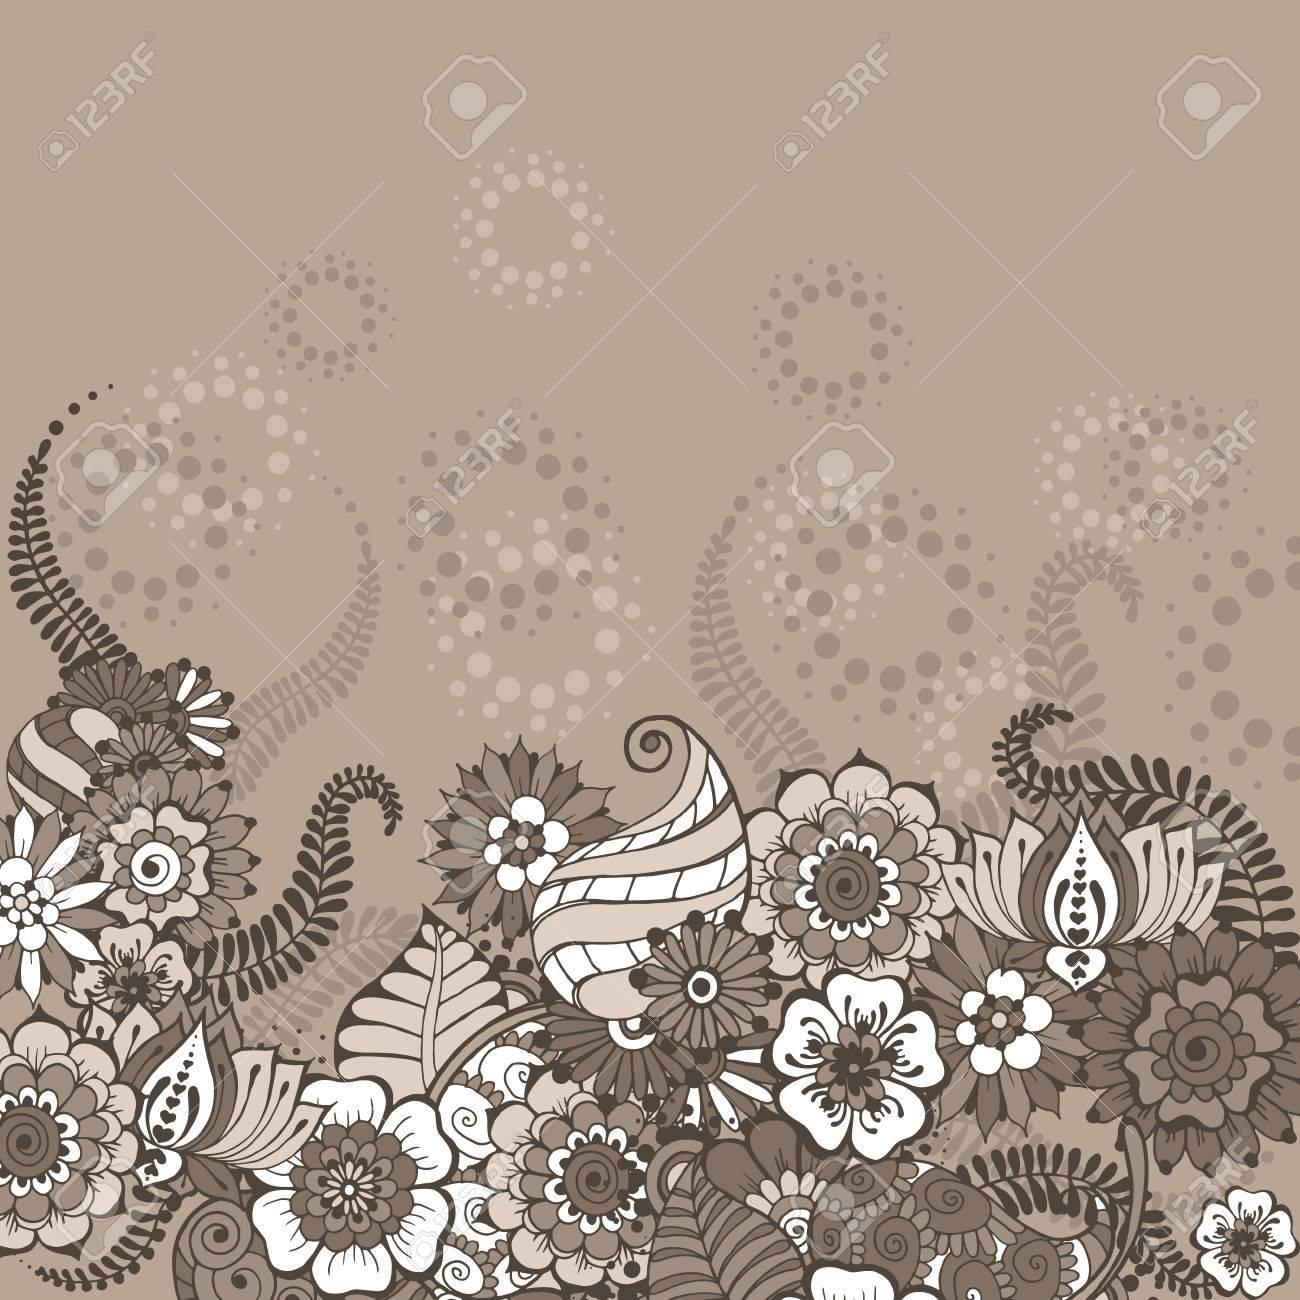 Ornate vector card template in indian mehndi style background ornate vector card template in indian mehndi style background in coffee colors invitation stopboris Images